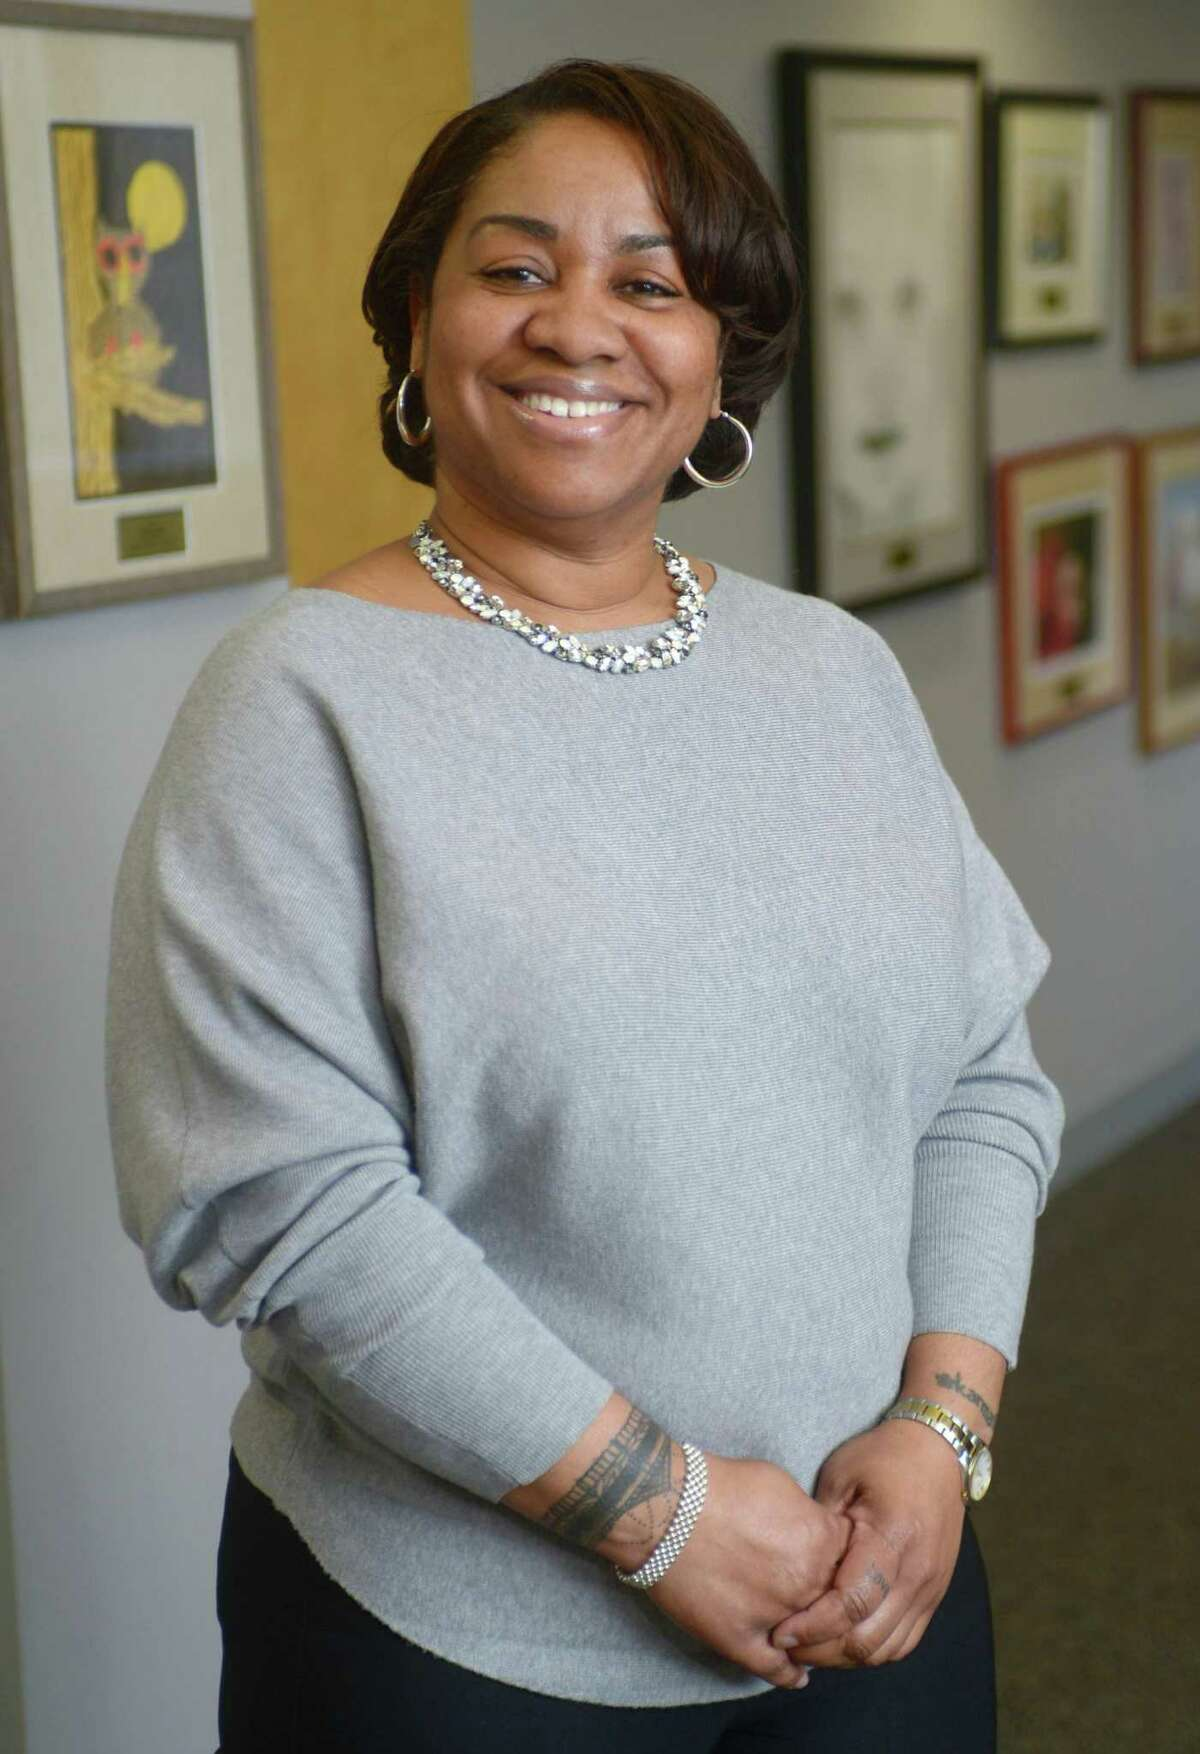 Norwalk High School Assistant Principal and Director of The Norwalk Early College Academy (NECA), Karen Amaker, in January 2019.